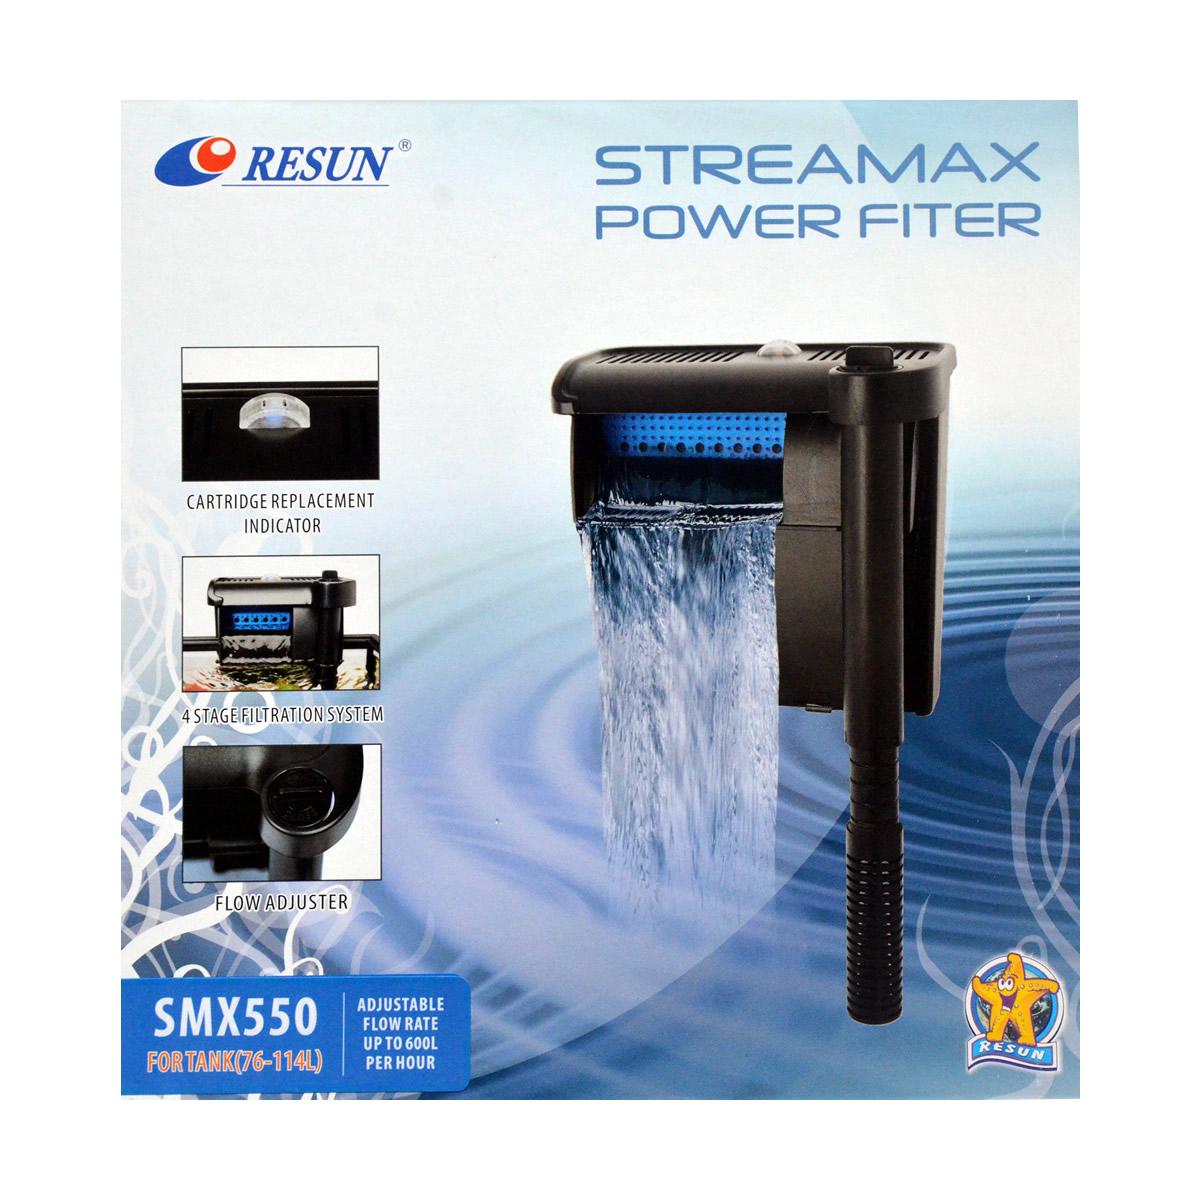 ReSun SMX550 Streamax Hang On Power Filter 6.5W 600L/H 76-114L